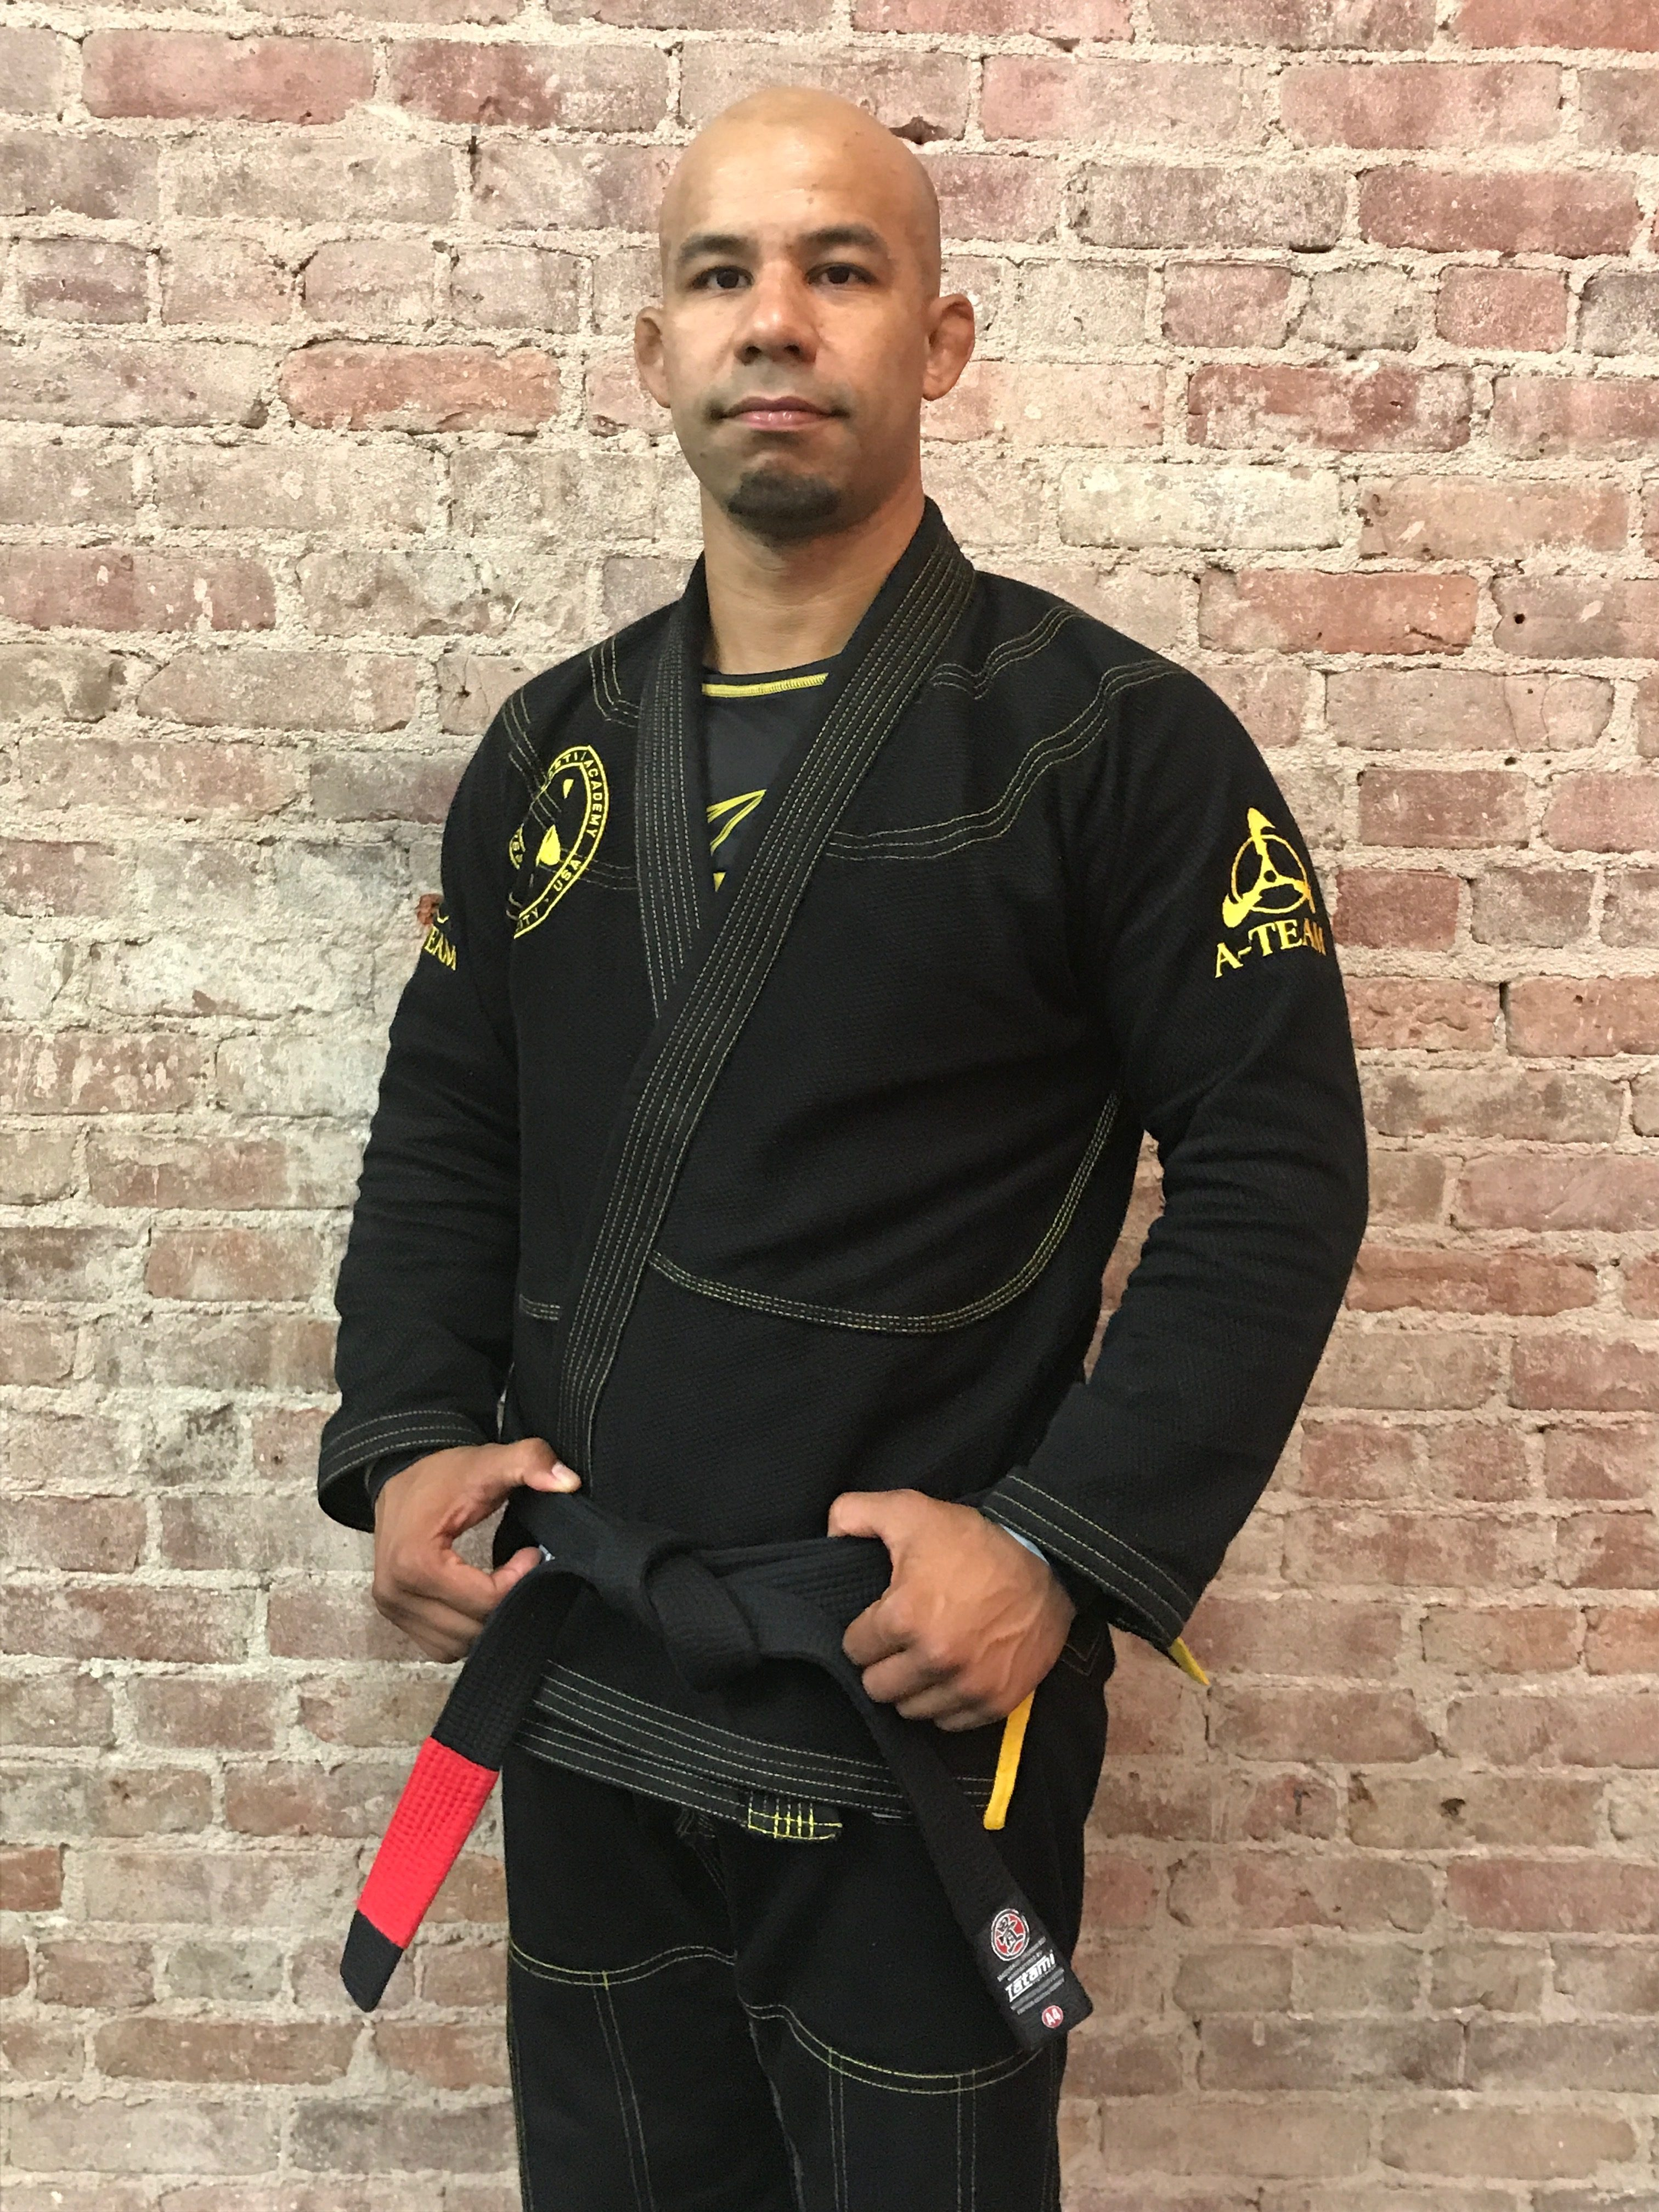 AMAA's New Brazilian JiuJitsu Instructor - ATeam & Team Clark Gracie NYC Team Up!